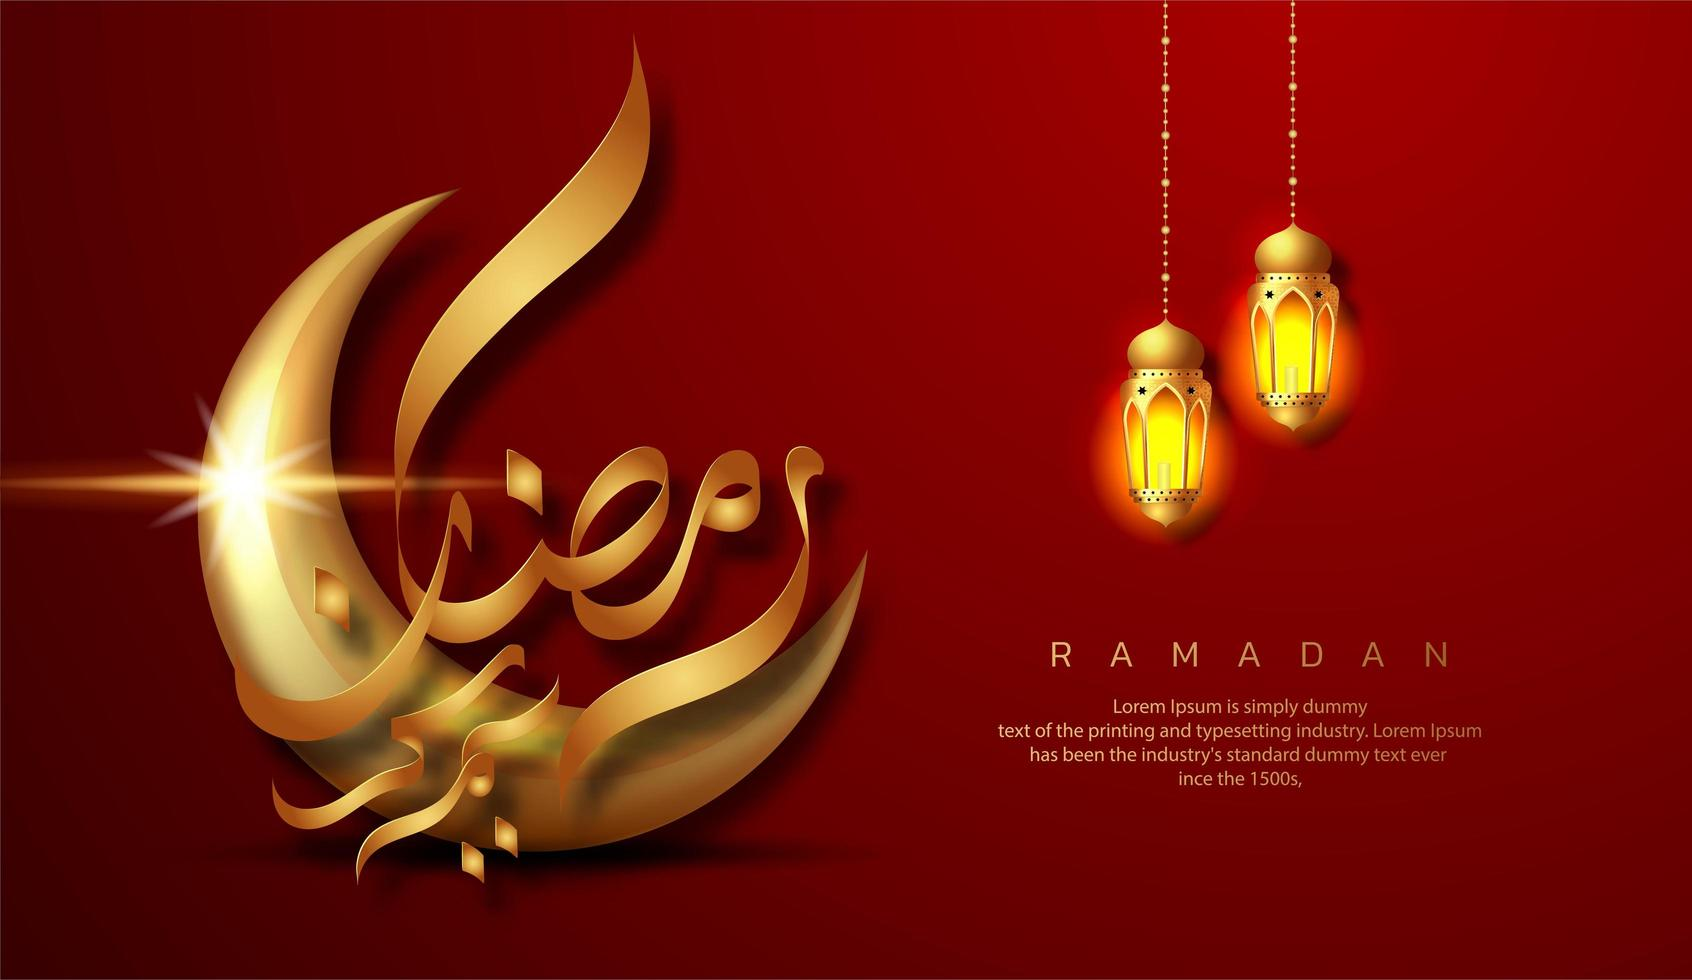 rode ramadan kareem met twee hangende lantaarns vector